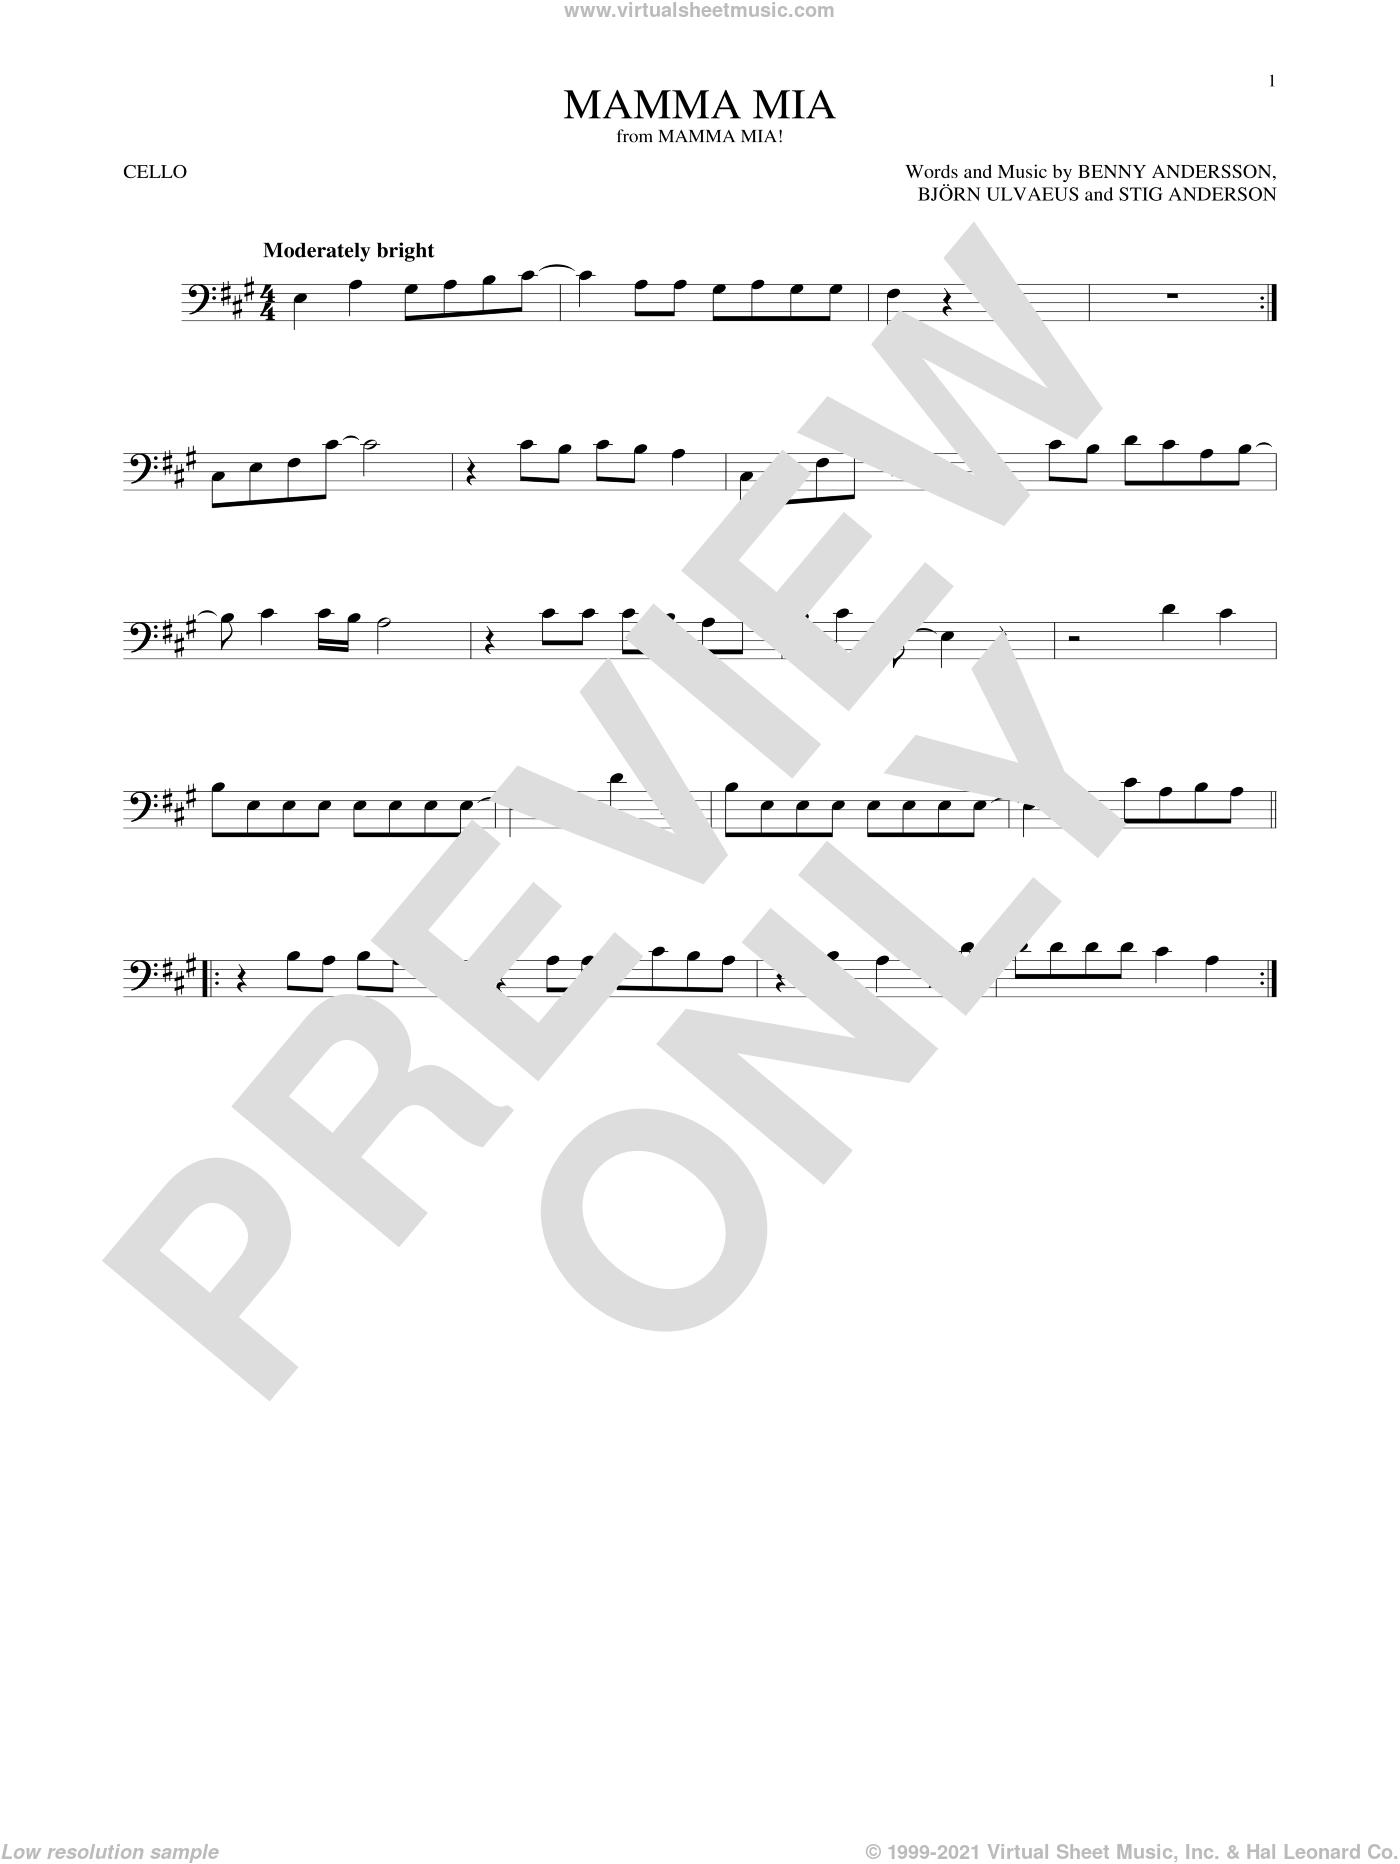 Mamma Mia sheet music for cello solo by ABBA, Meryl Streep, Benny Andersson, Bjorn Ulvaeus and Stig Anderson, intermediate skill level